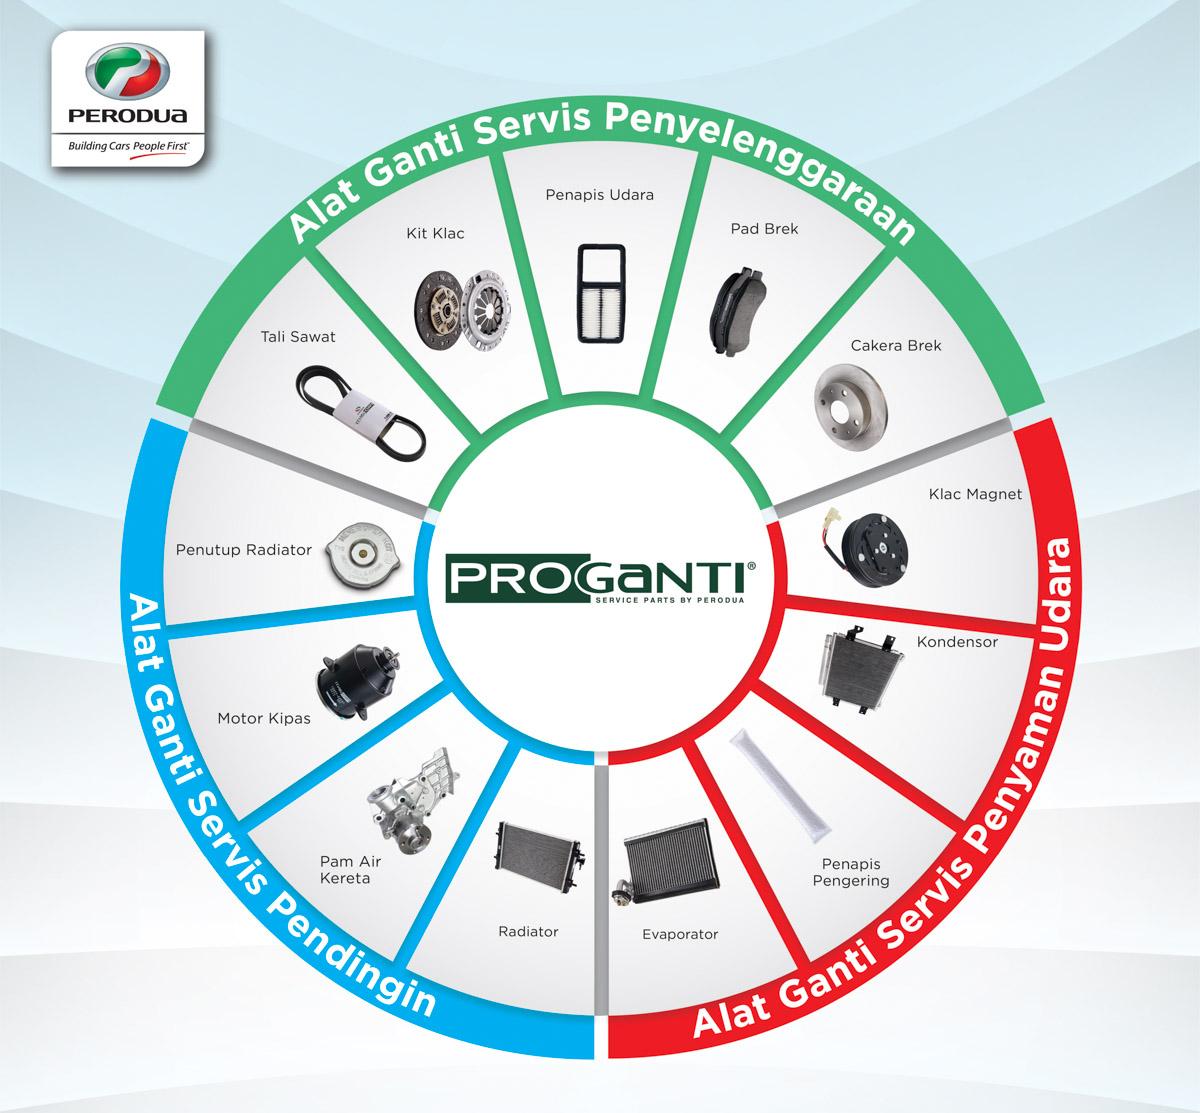 Perodua ProGanti 是什么?原来它好处多多!